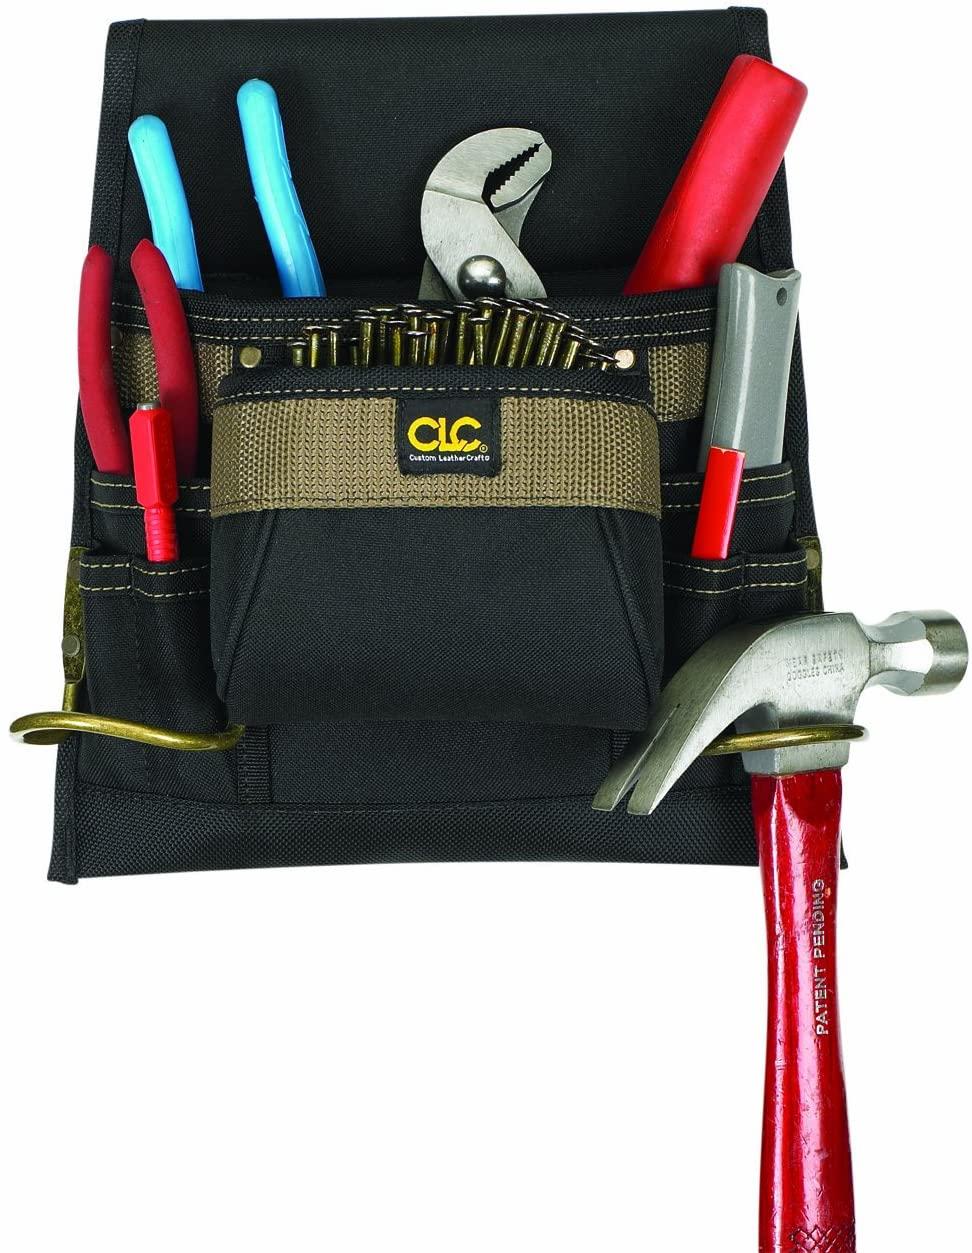 CLC Custom Leathercraft 1823 Nail and Tool Bag, Poly, 8-Pocket